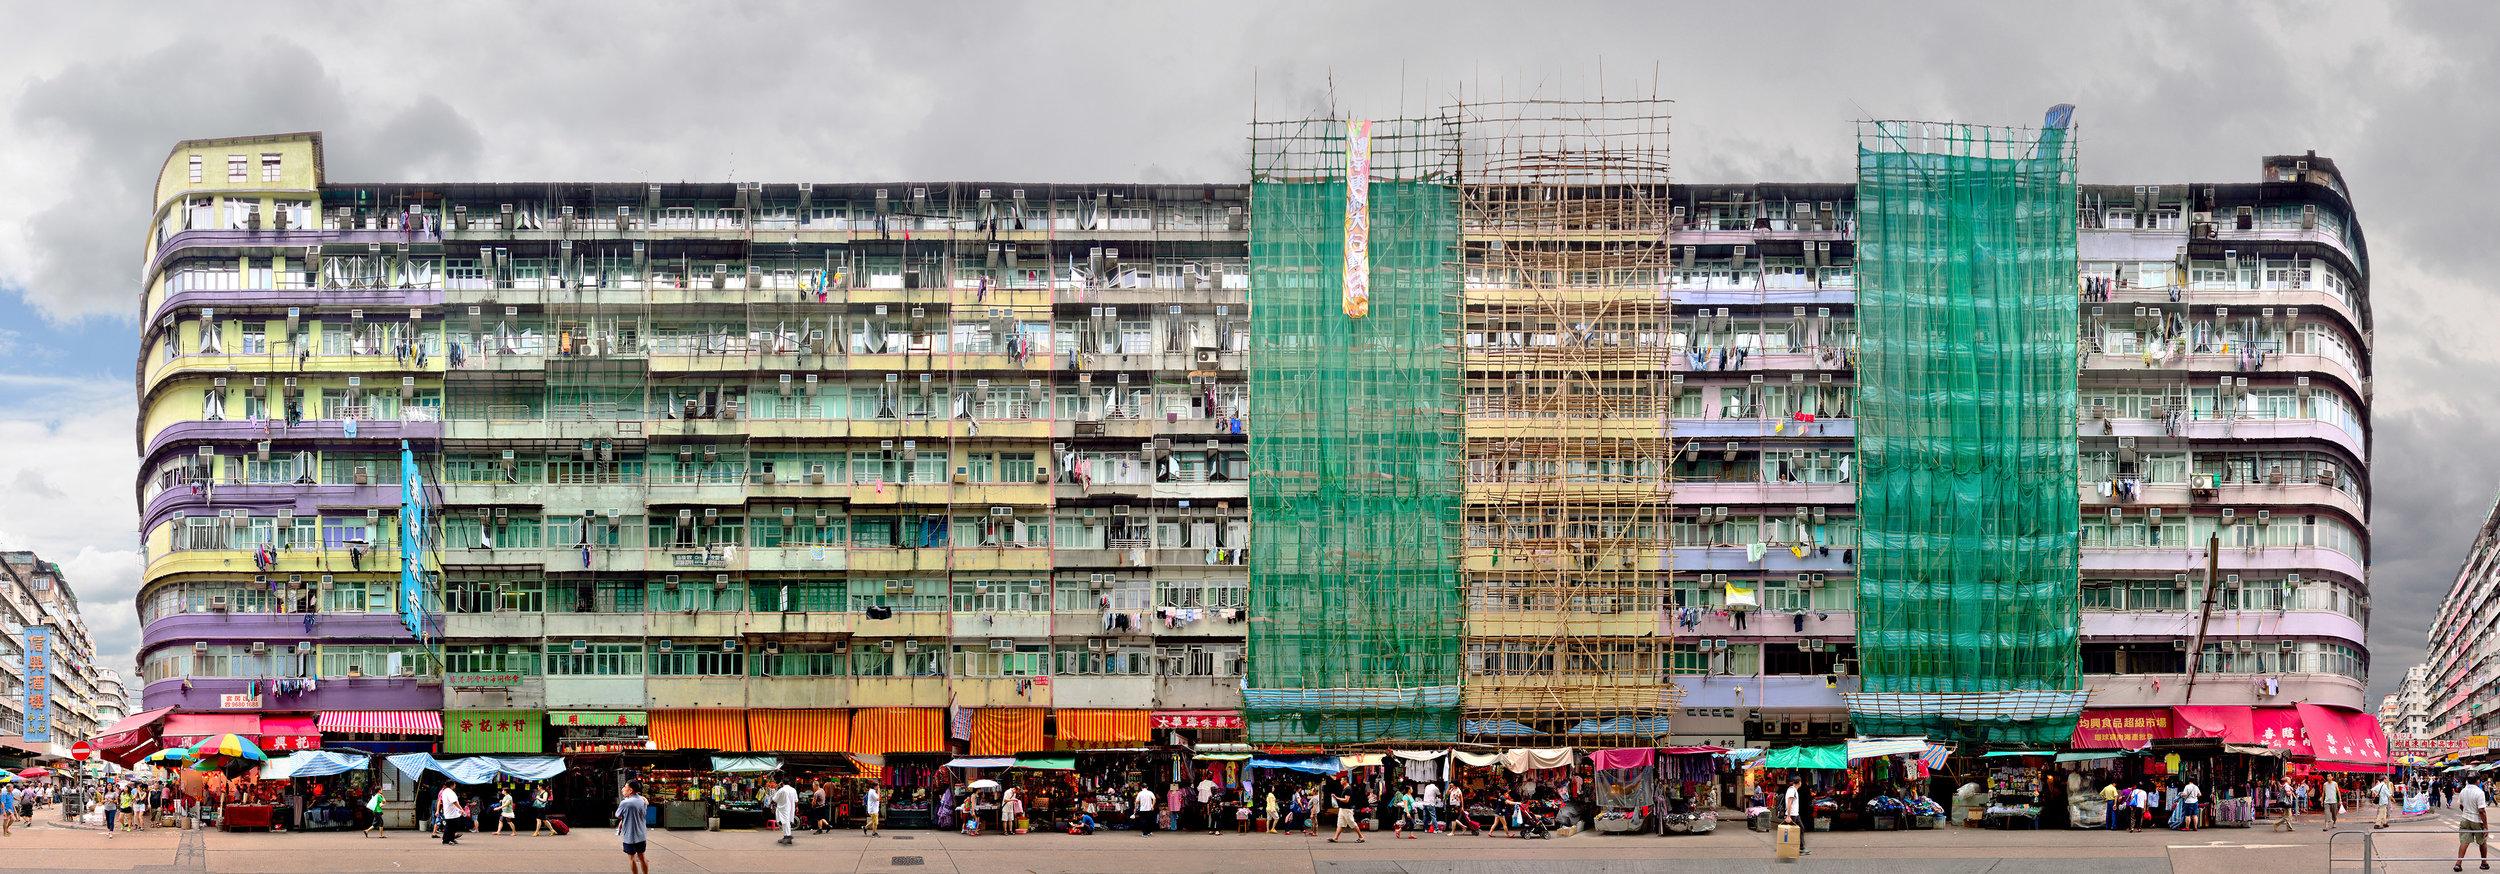 The Last Tong Lau - Stefan Irvine 'Ki Lung Street, Sham Shui Po' (Hong Kong, 2014) Courtesy of Blue Lotus Gallery